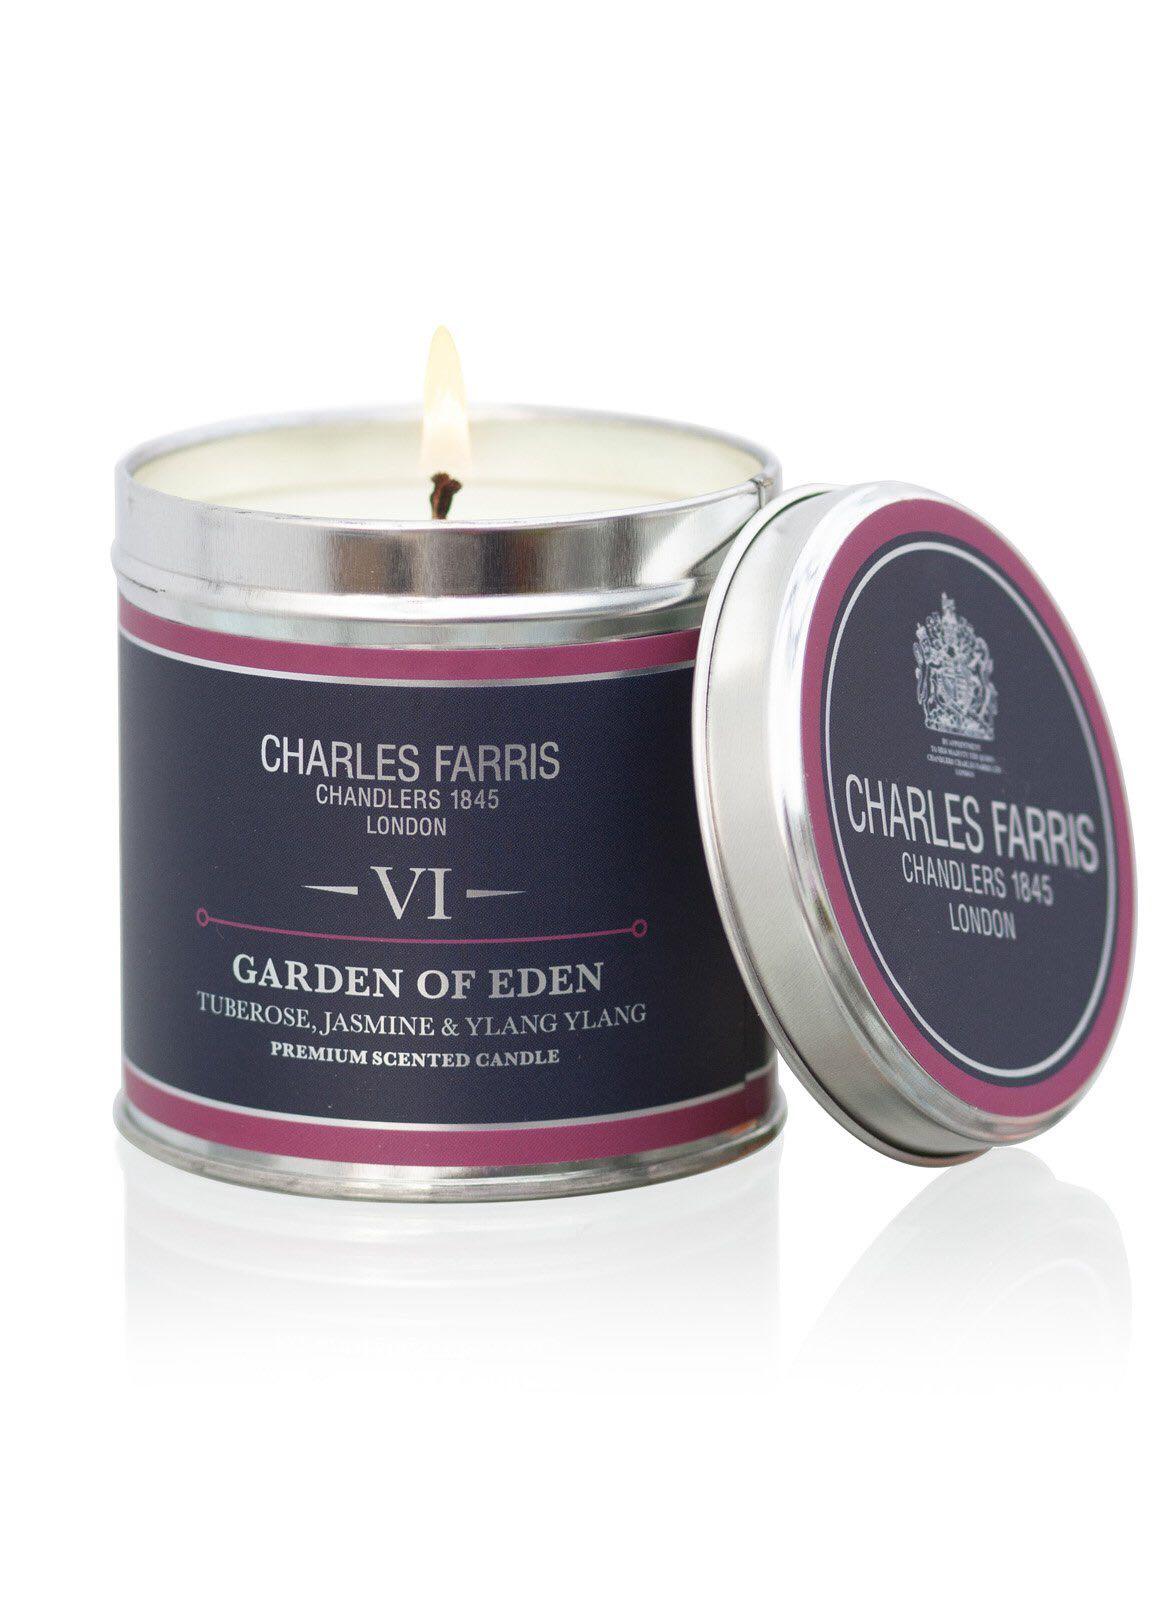 Charles Farris signature tin Garden of Eden 300g 40 hour burn time